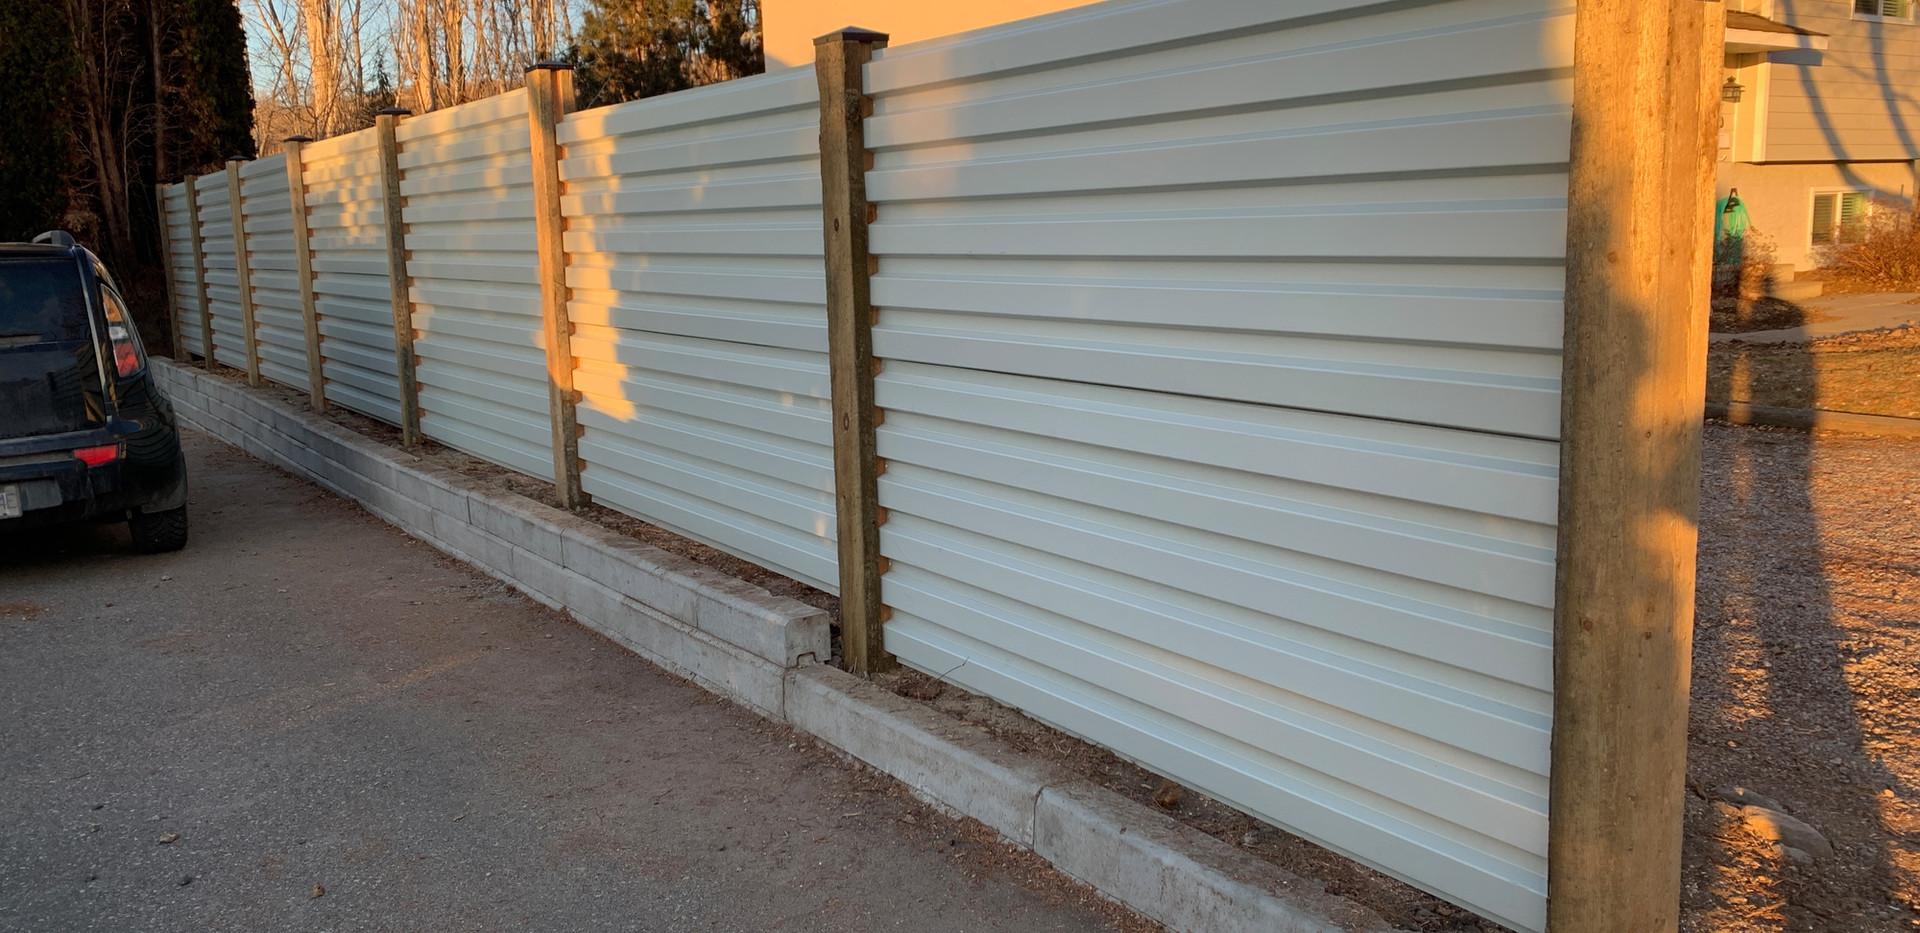 White corrugated metal fence